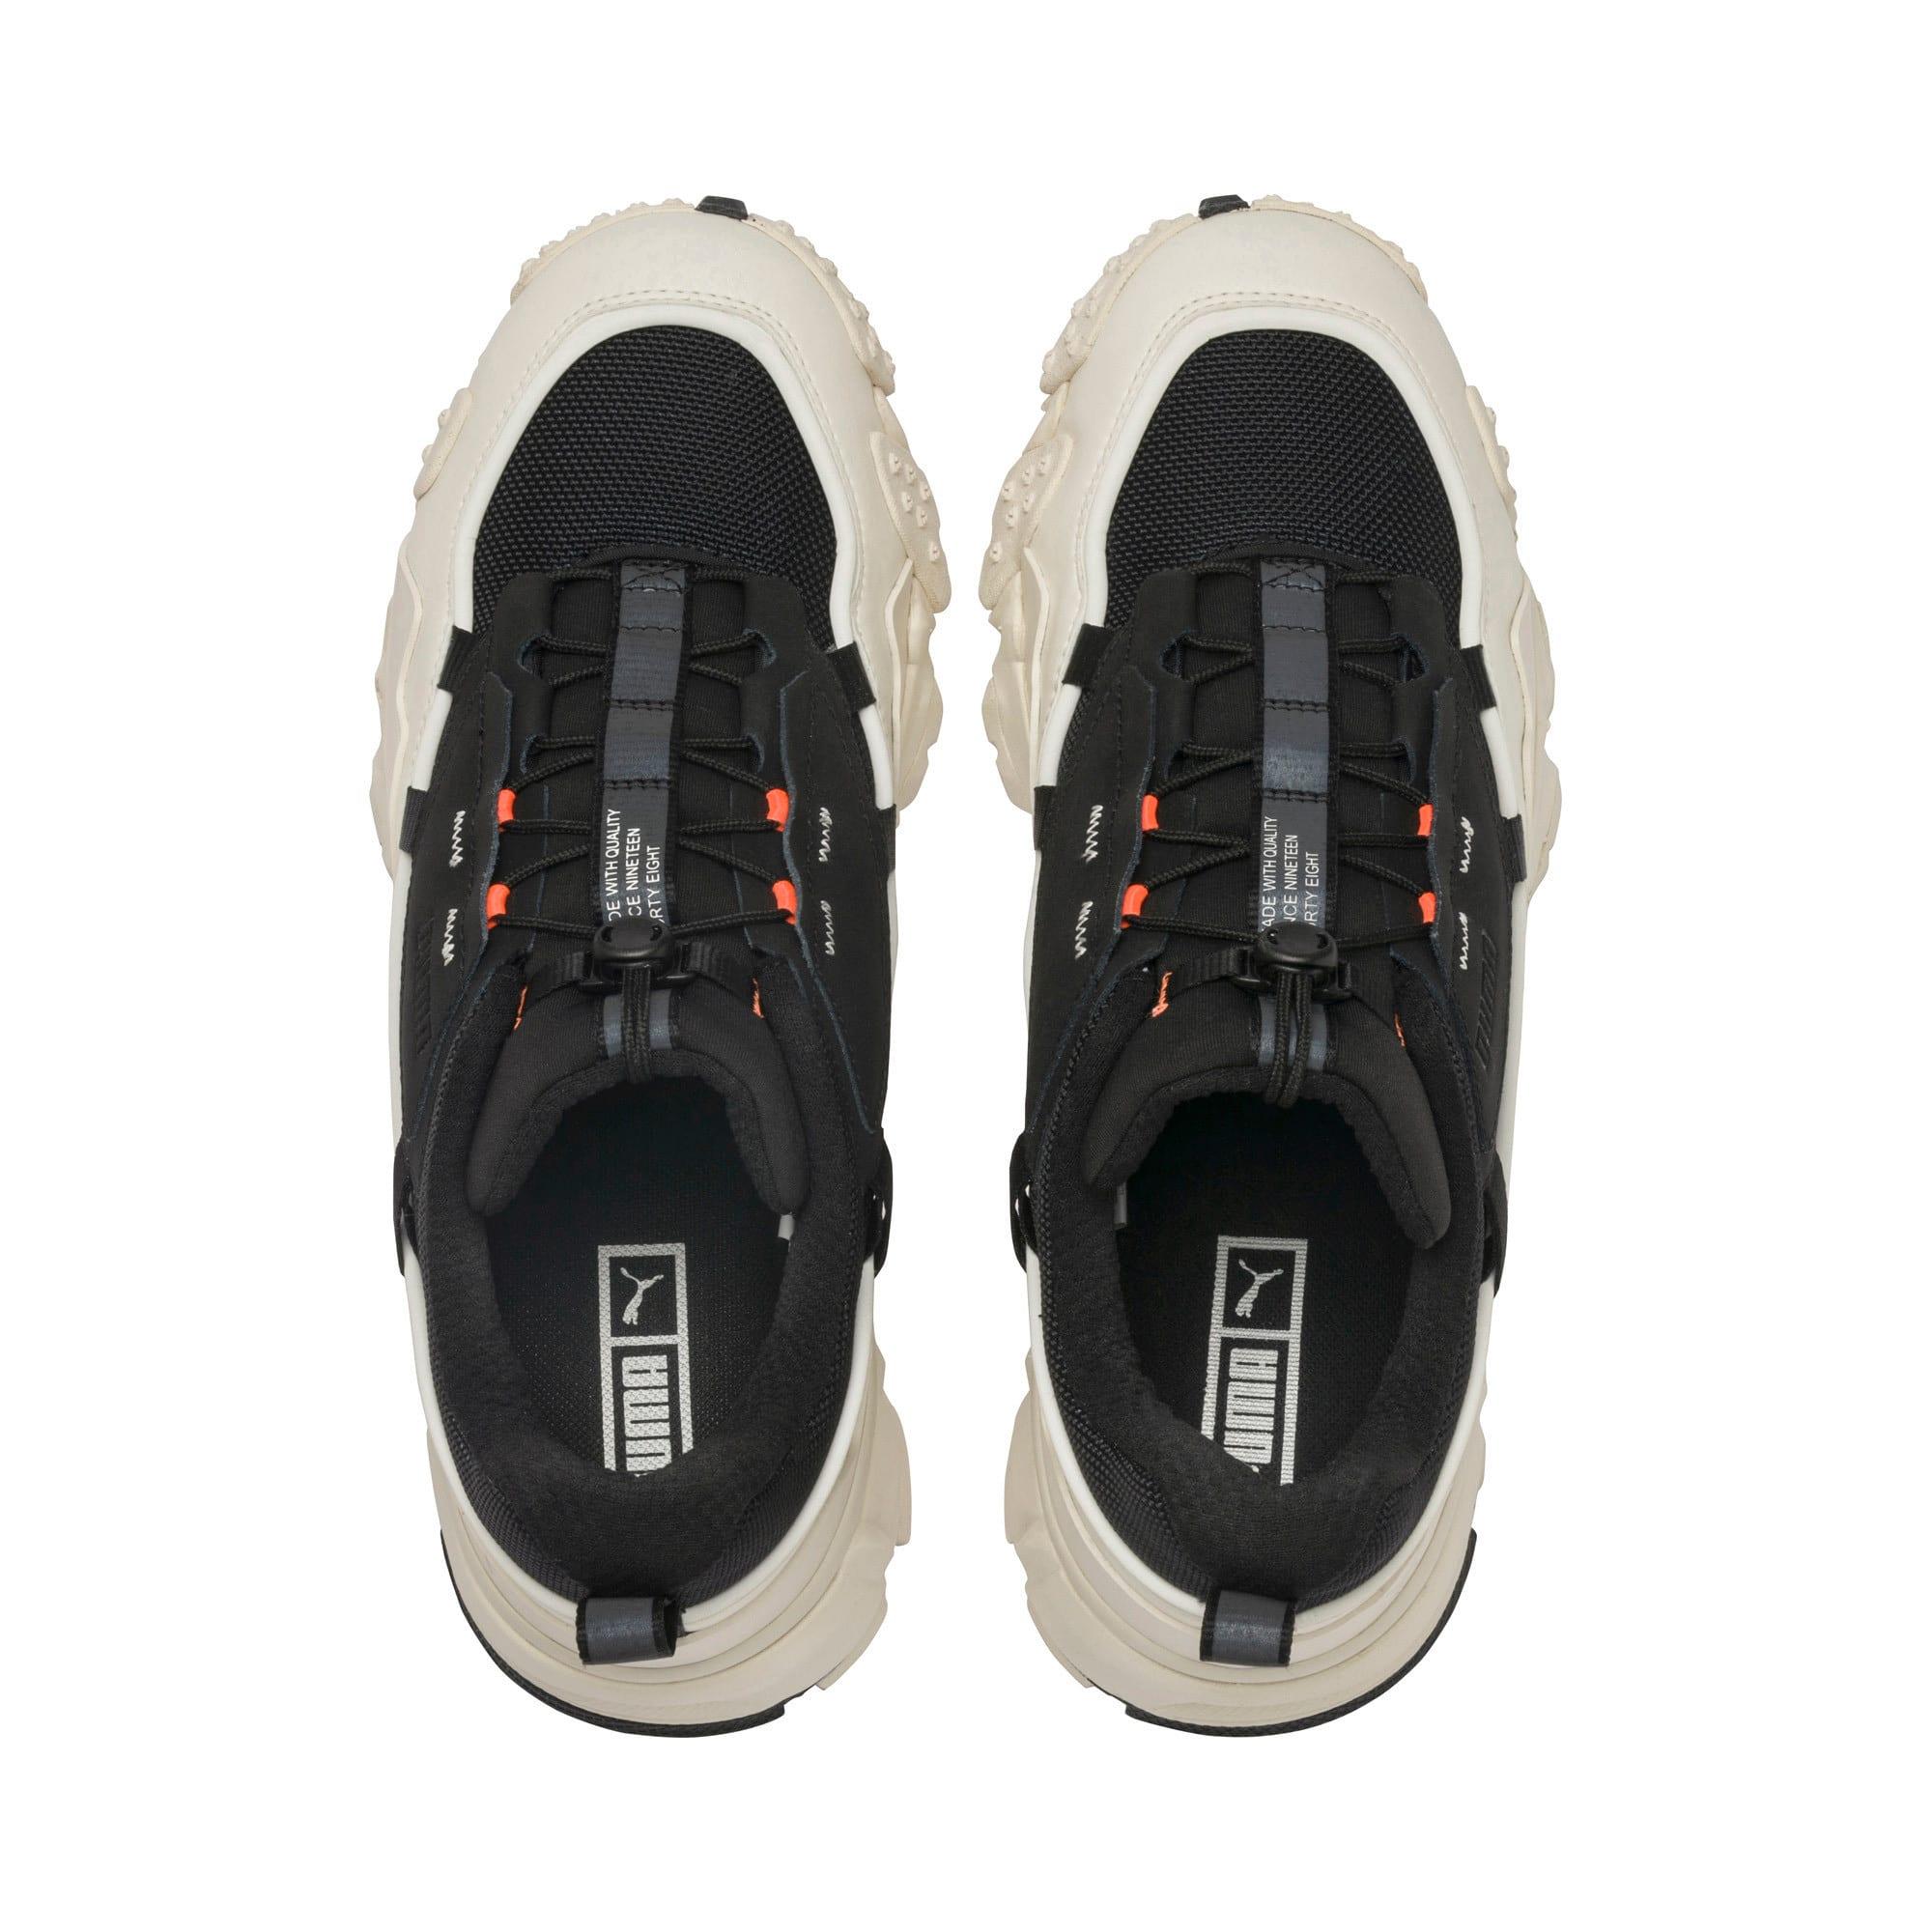 Thumbnail 7 of Trailfox Overland Sneakers, Puma Black-Whisper White, medium